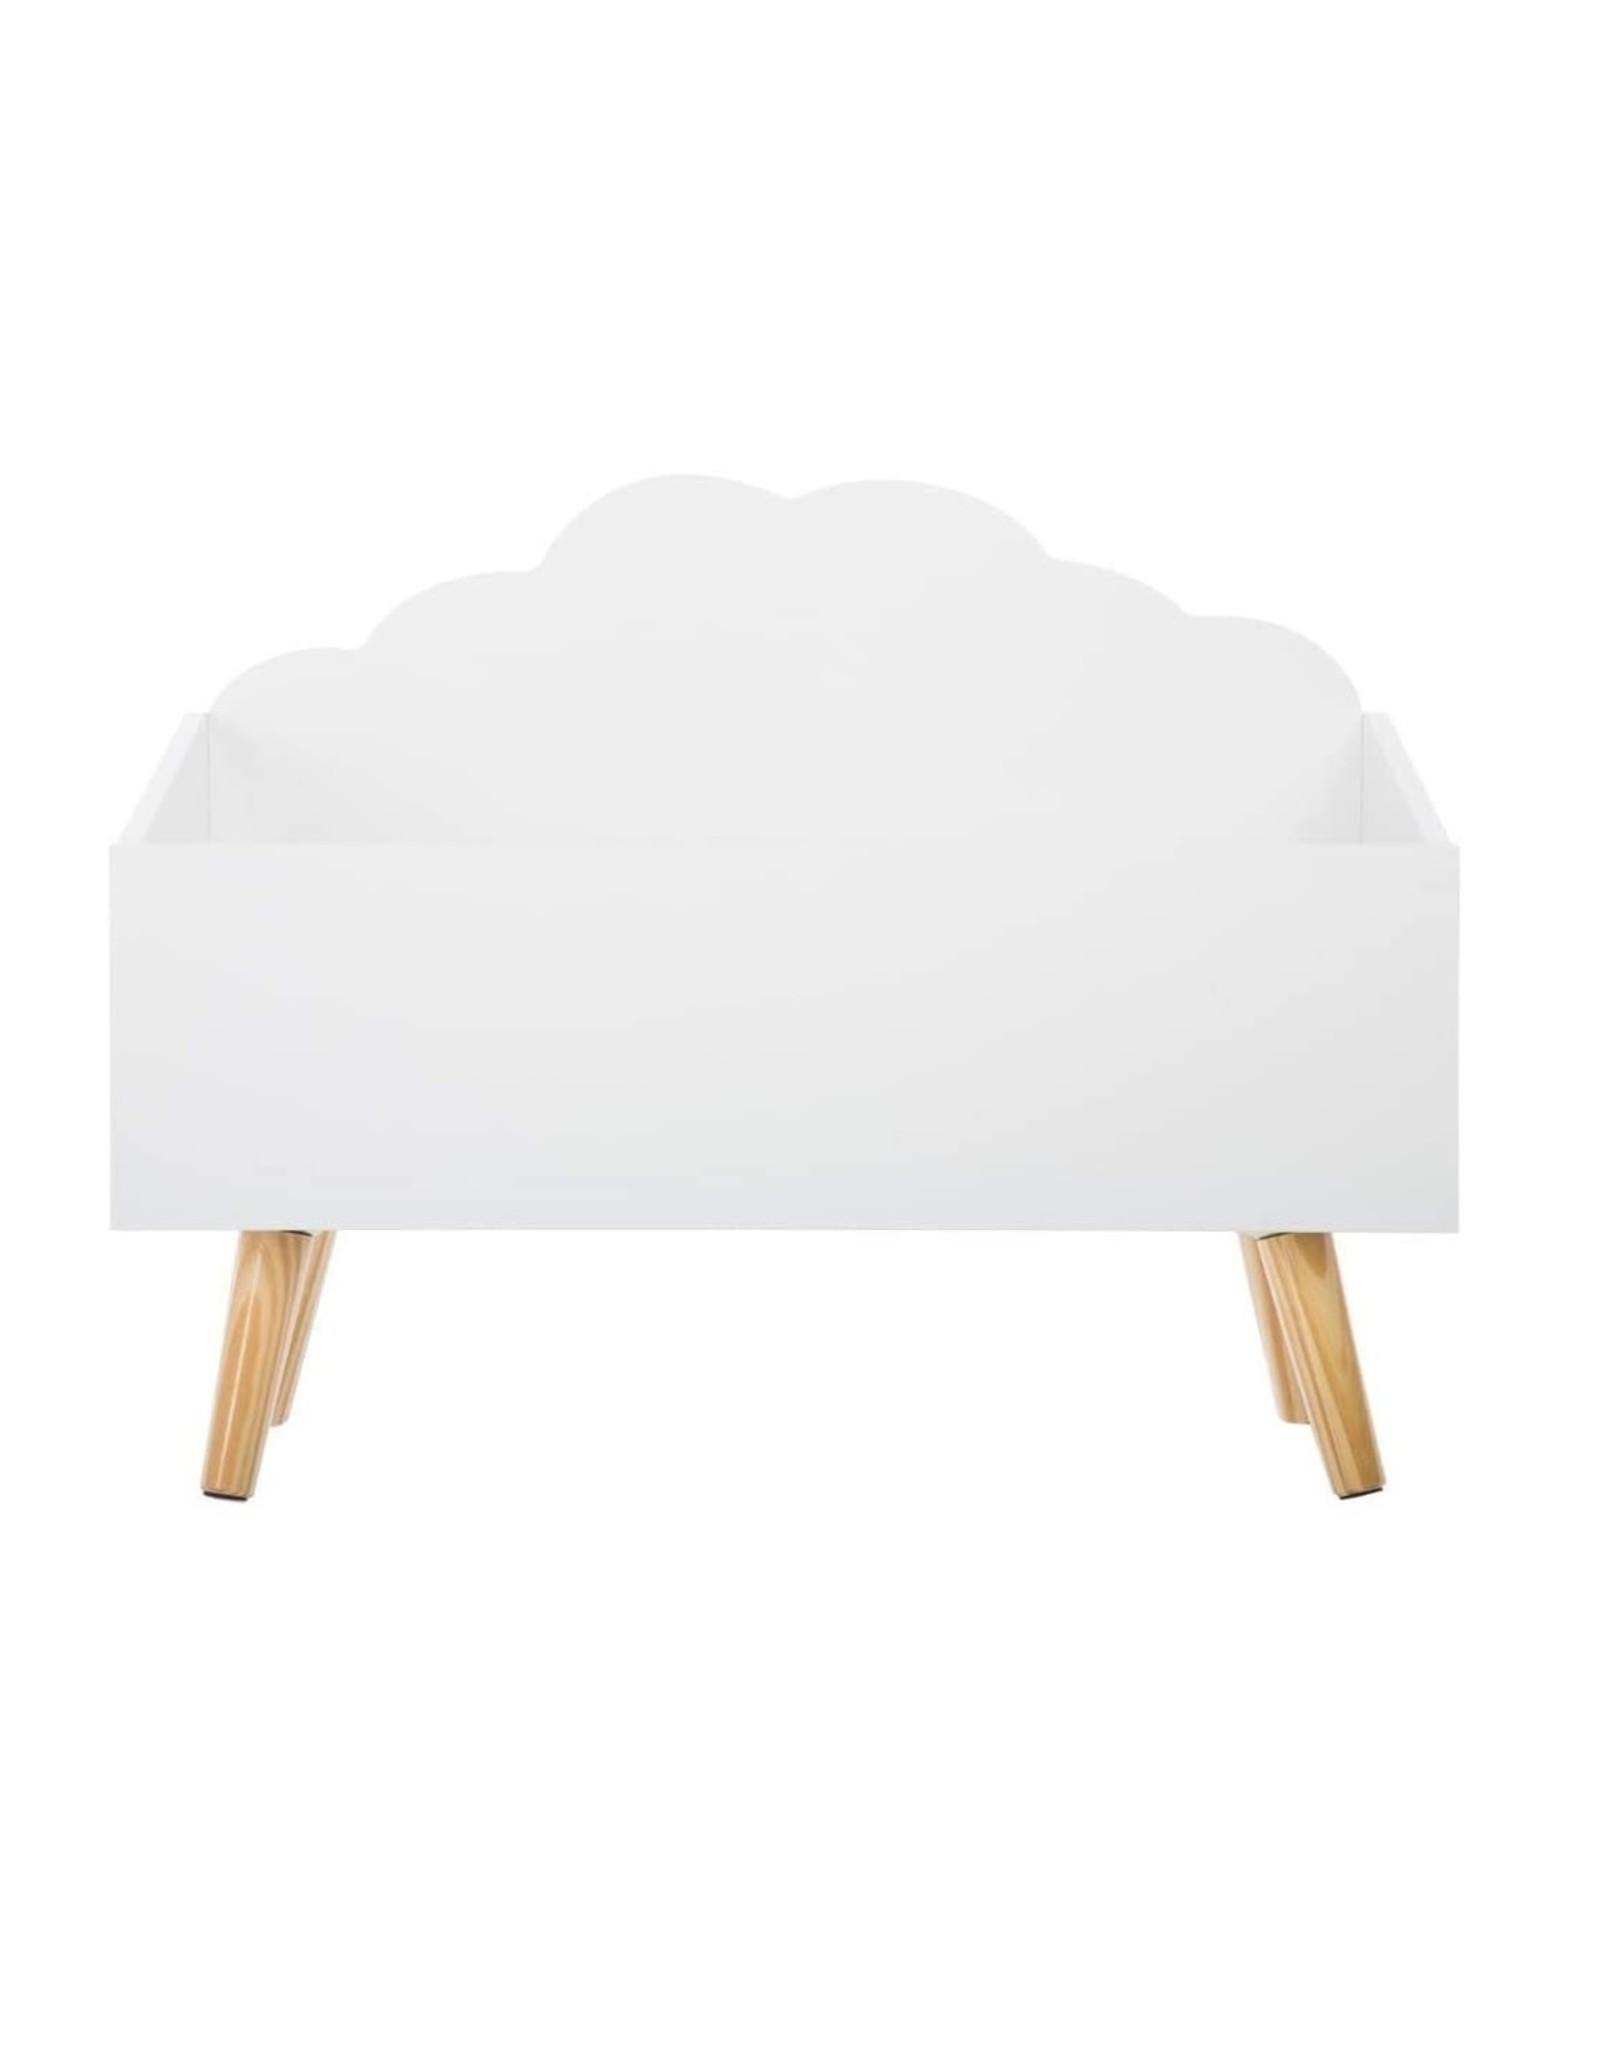 Atmosphera Atmosphera - Speelgoedkist – Wolkenvorm – Wit